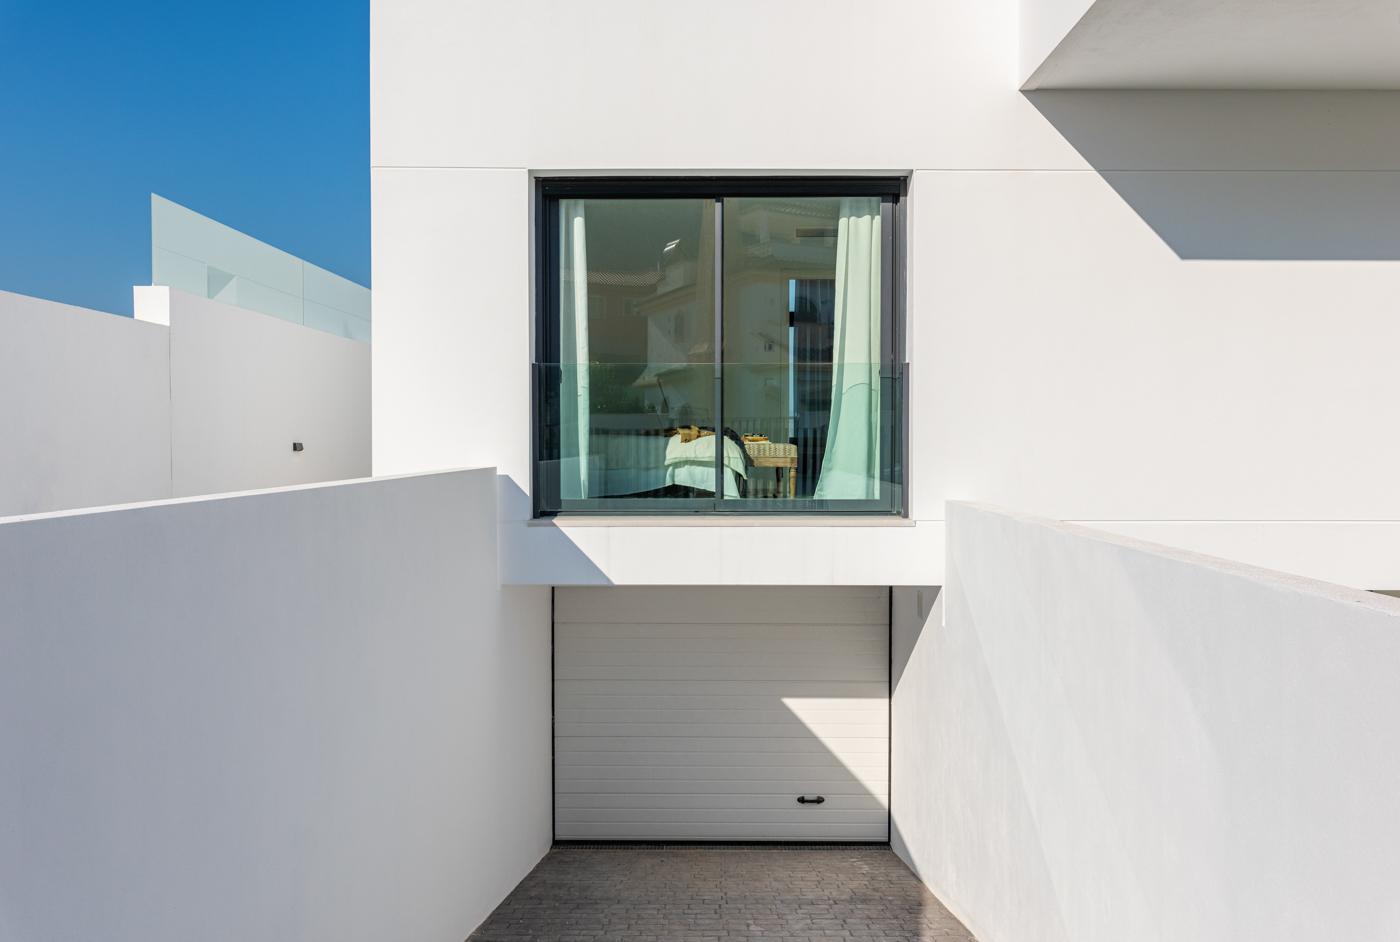 61 - Venecia III - Garage exterior view